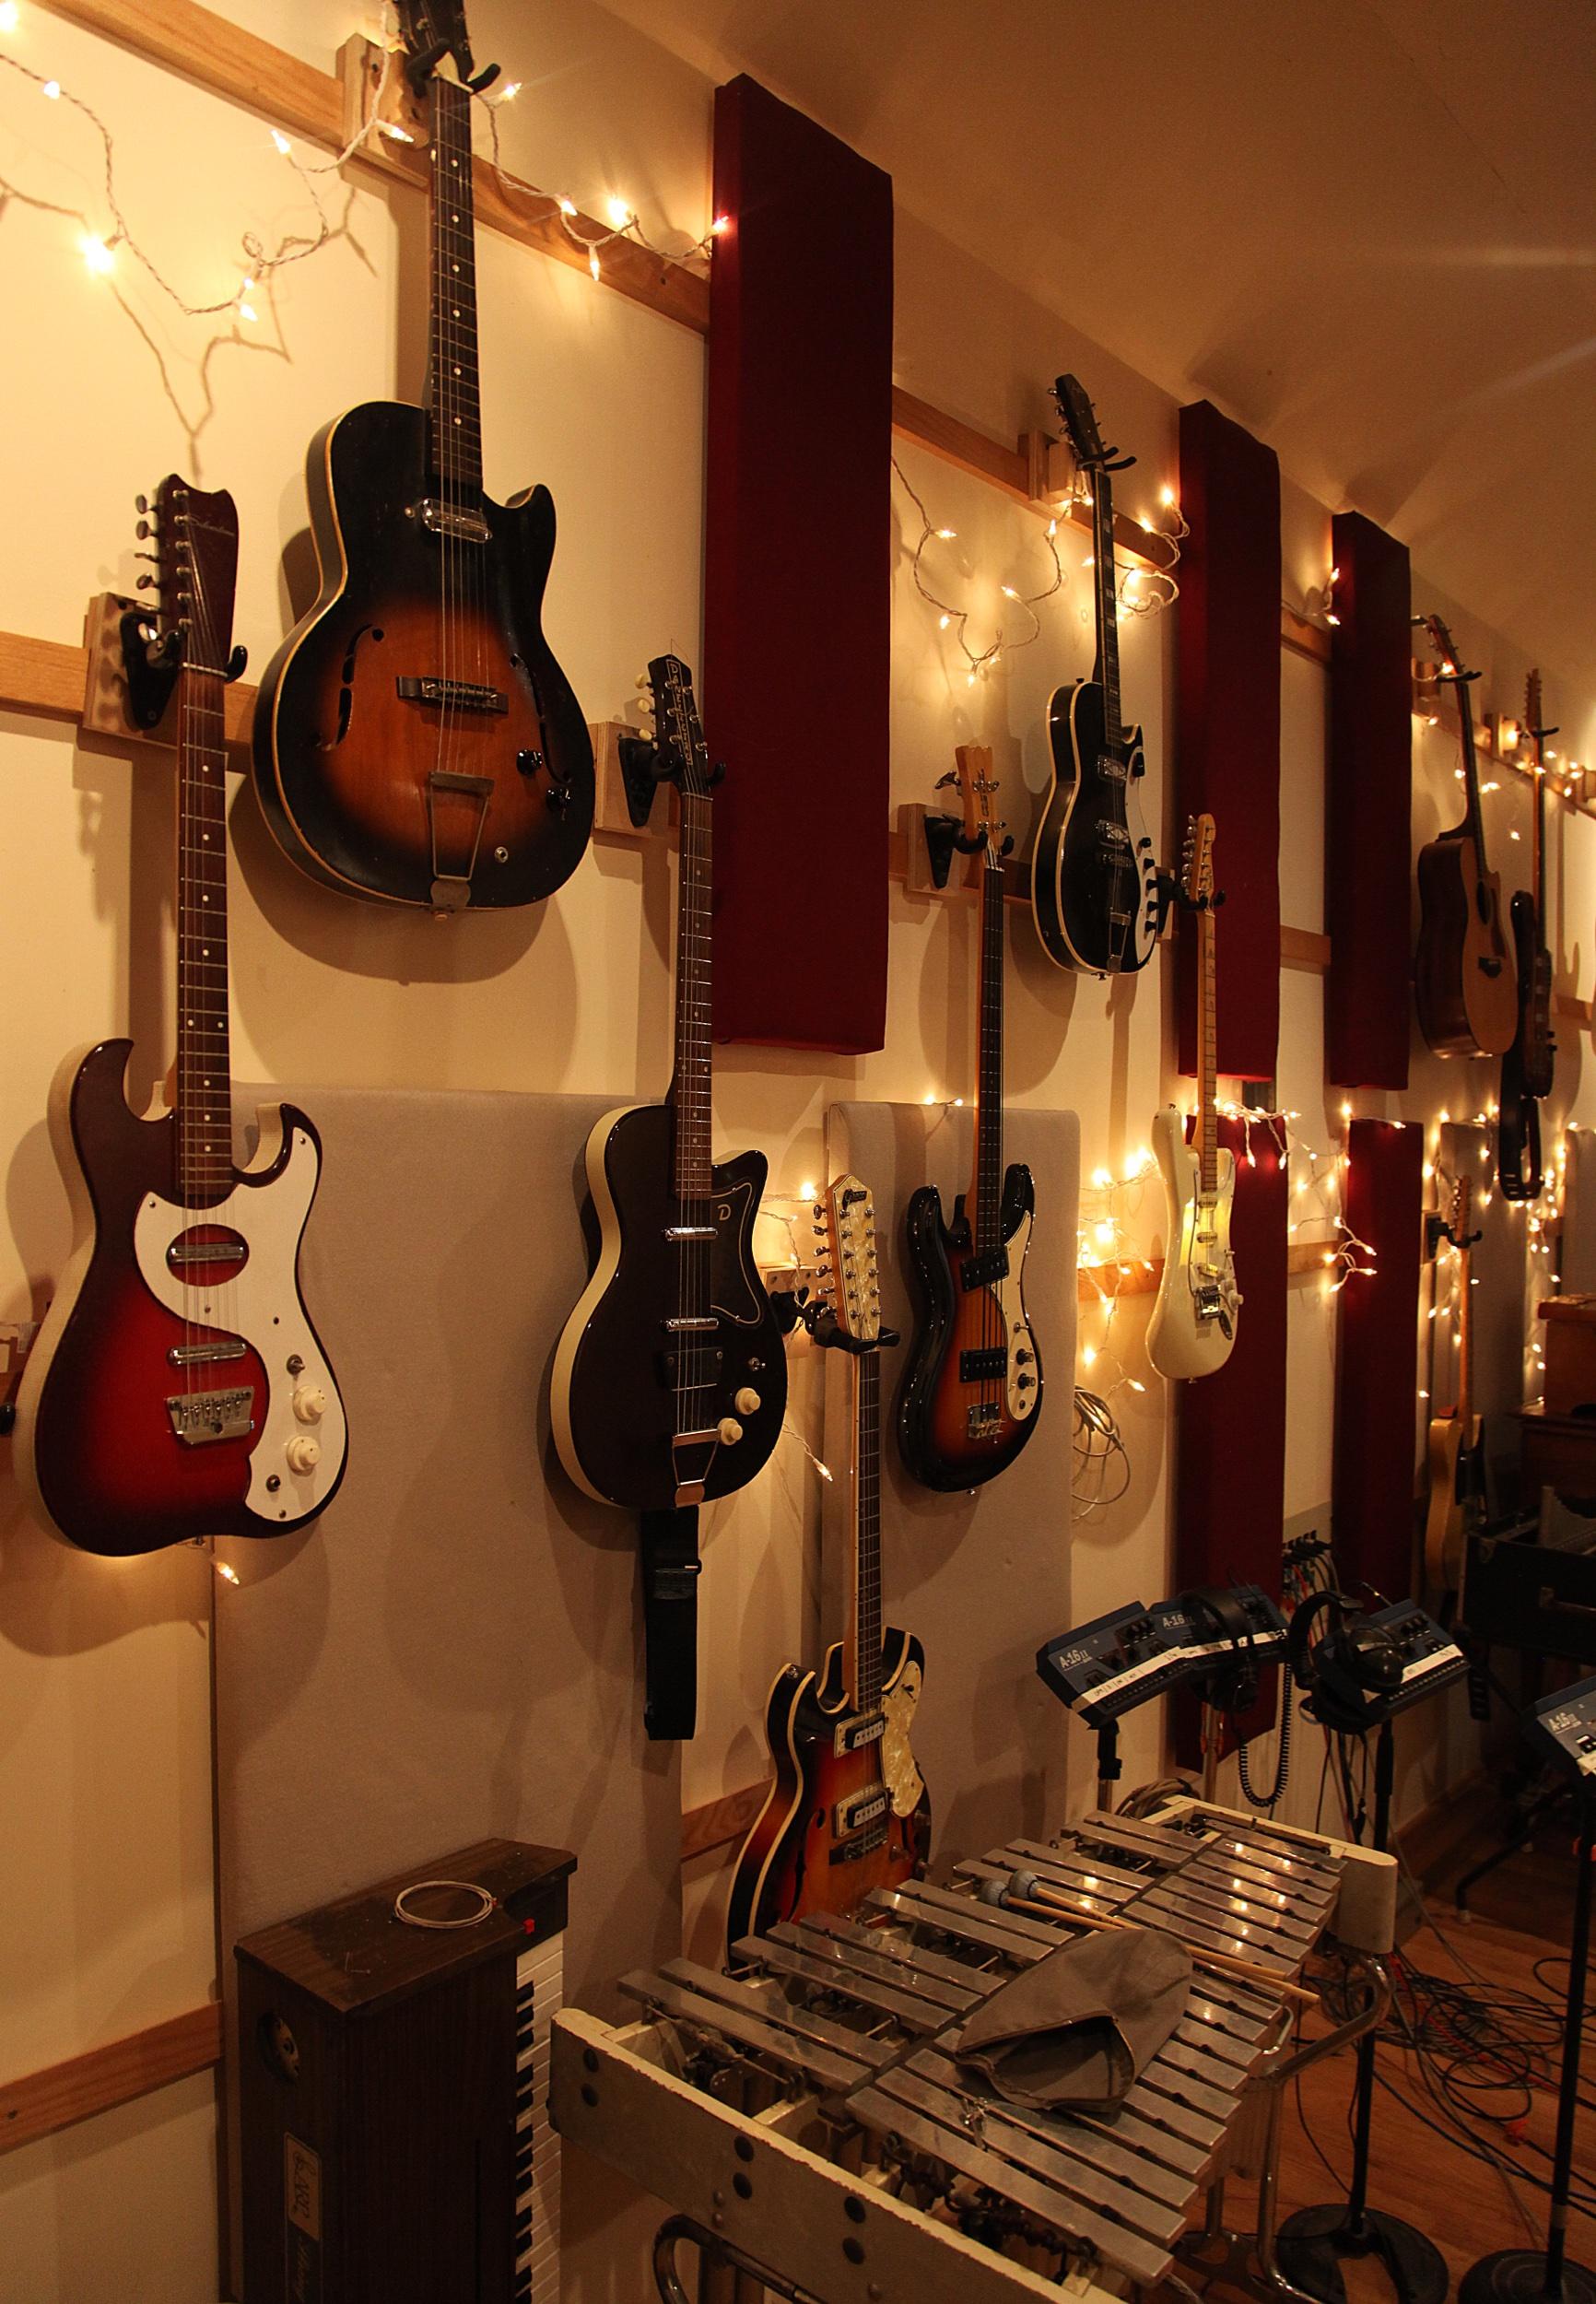 decibelle_guitars_1.jpeg